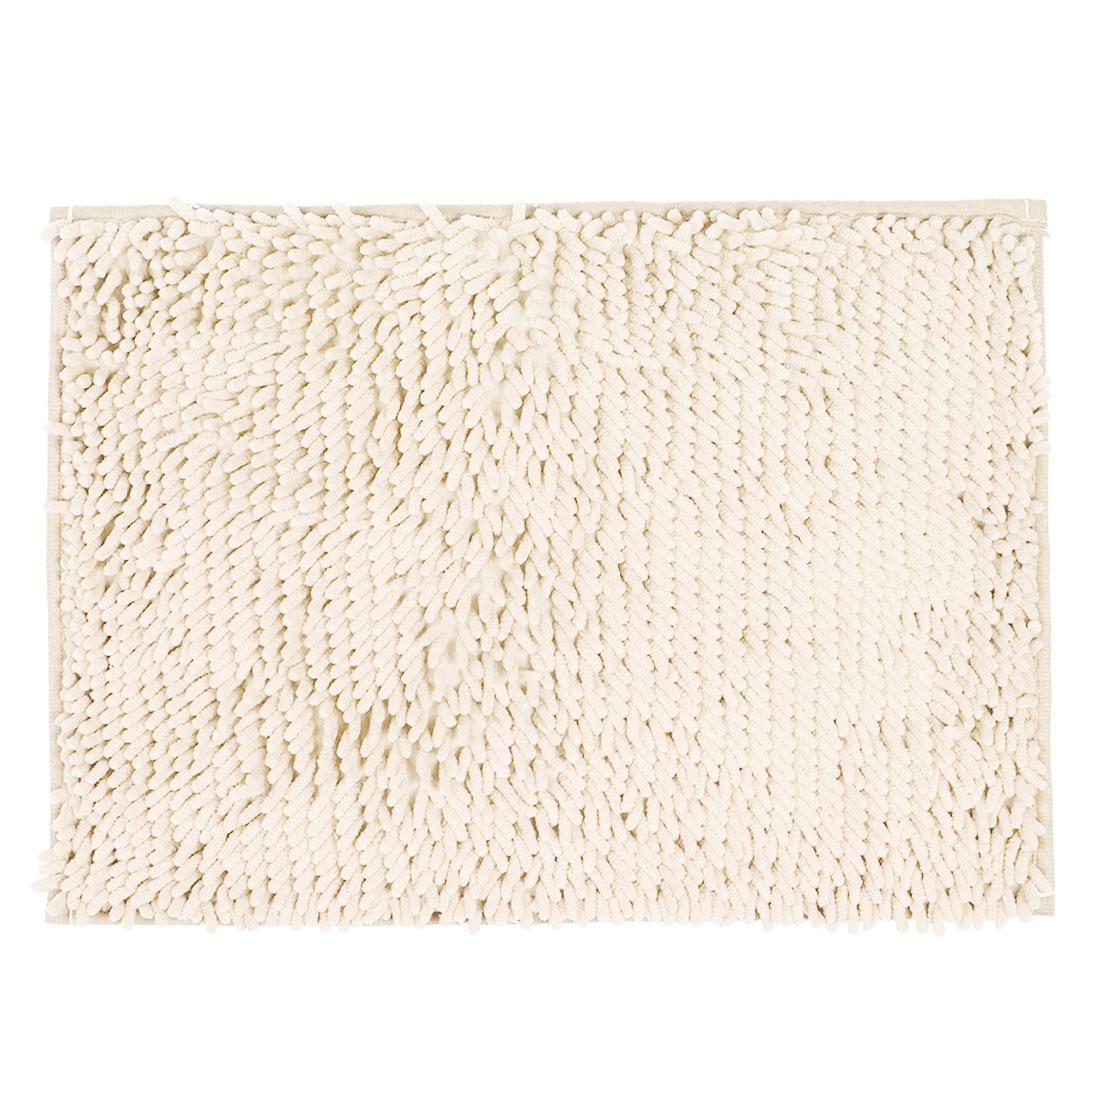 Home-Bedroom-Chenille-Anti-Skid-Floor-Rug-Mat-Carpet-Doormat-60cm-x-40cm